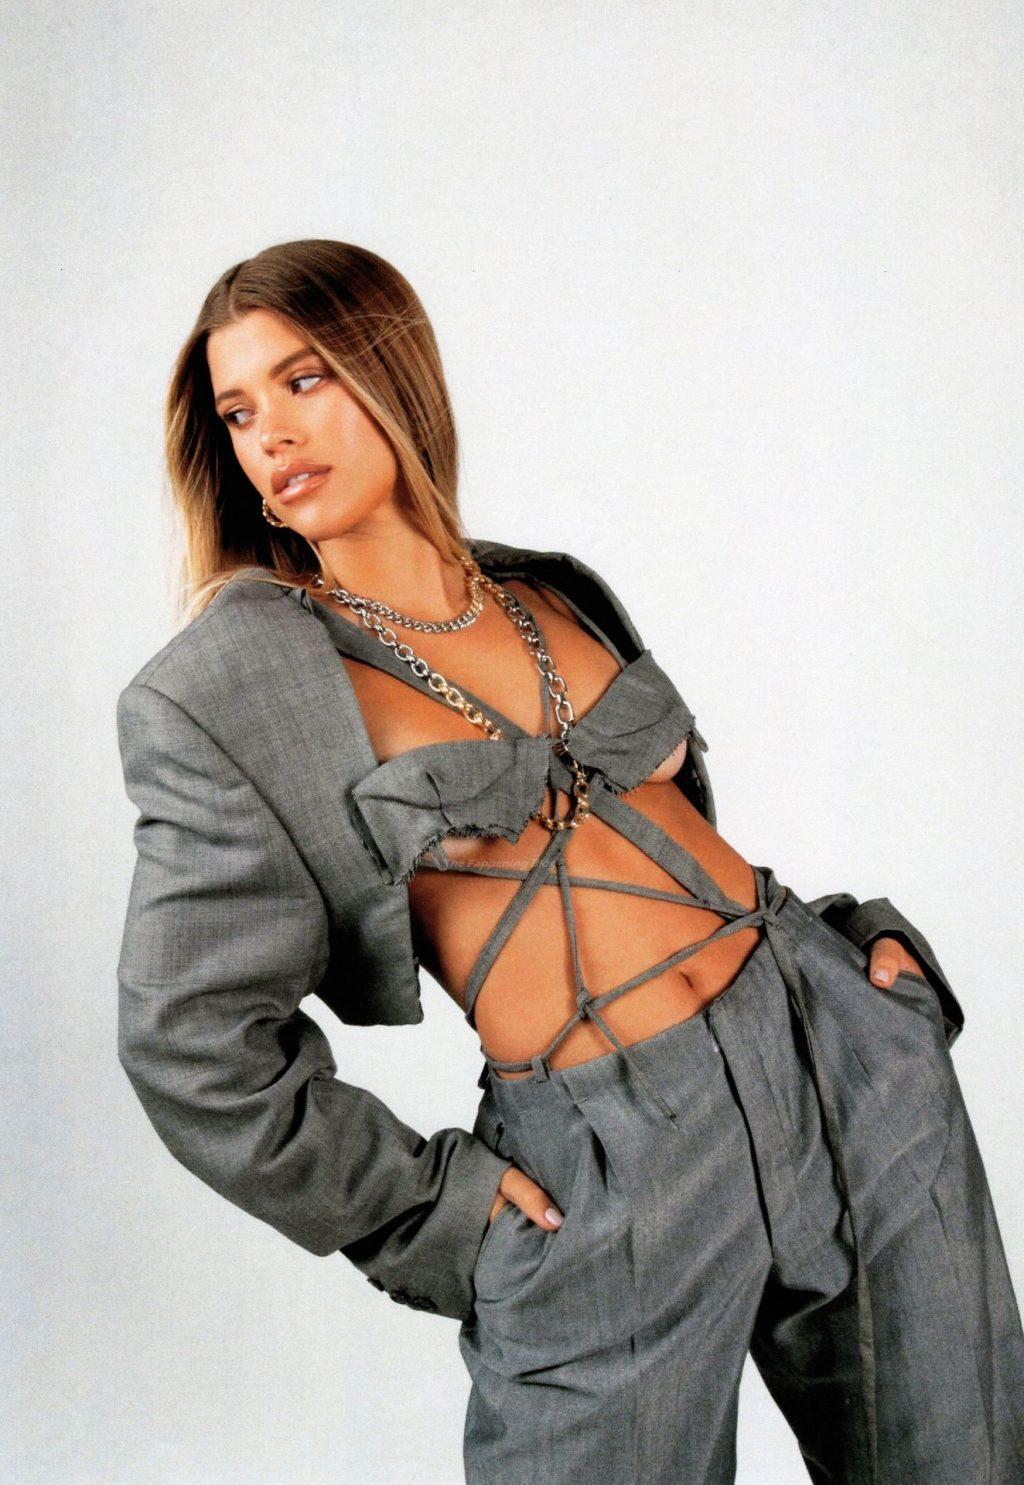 sofia-richie